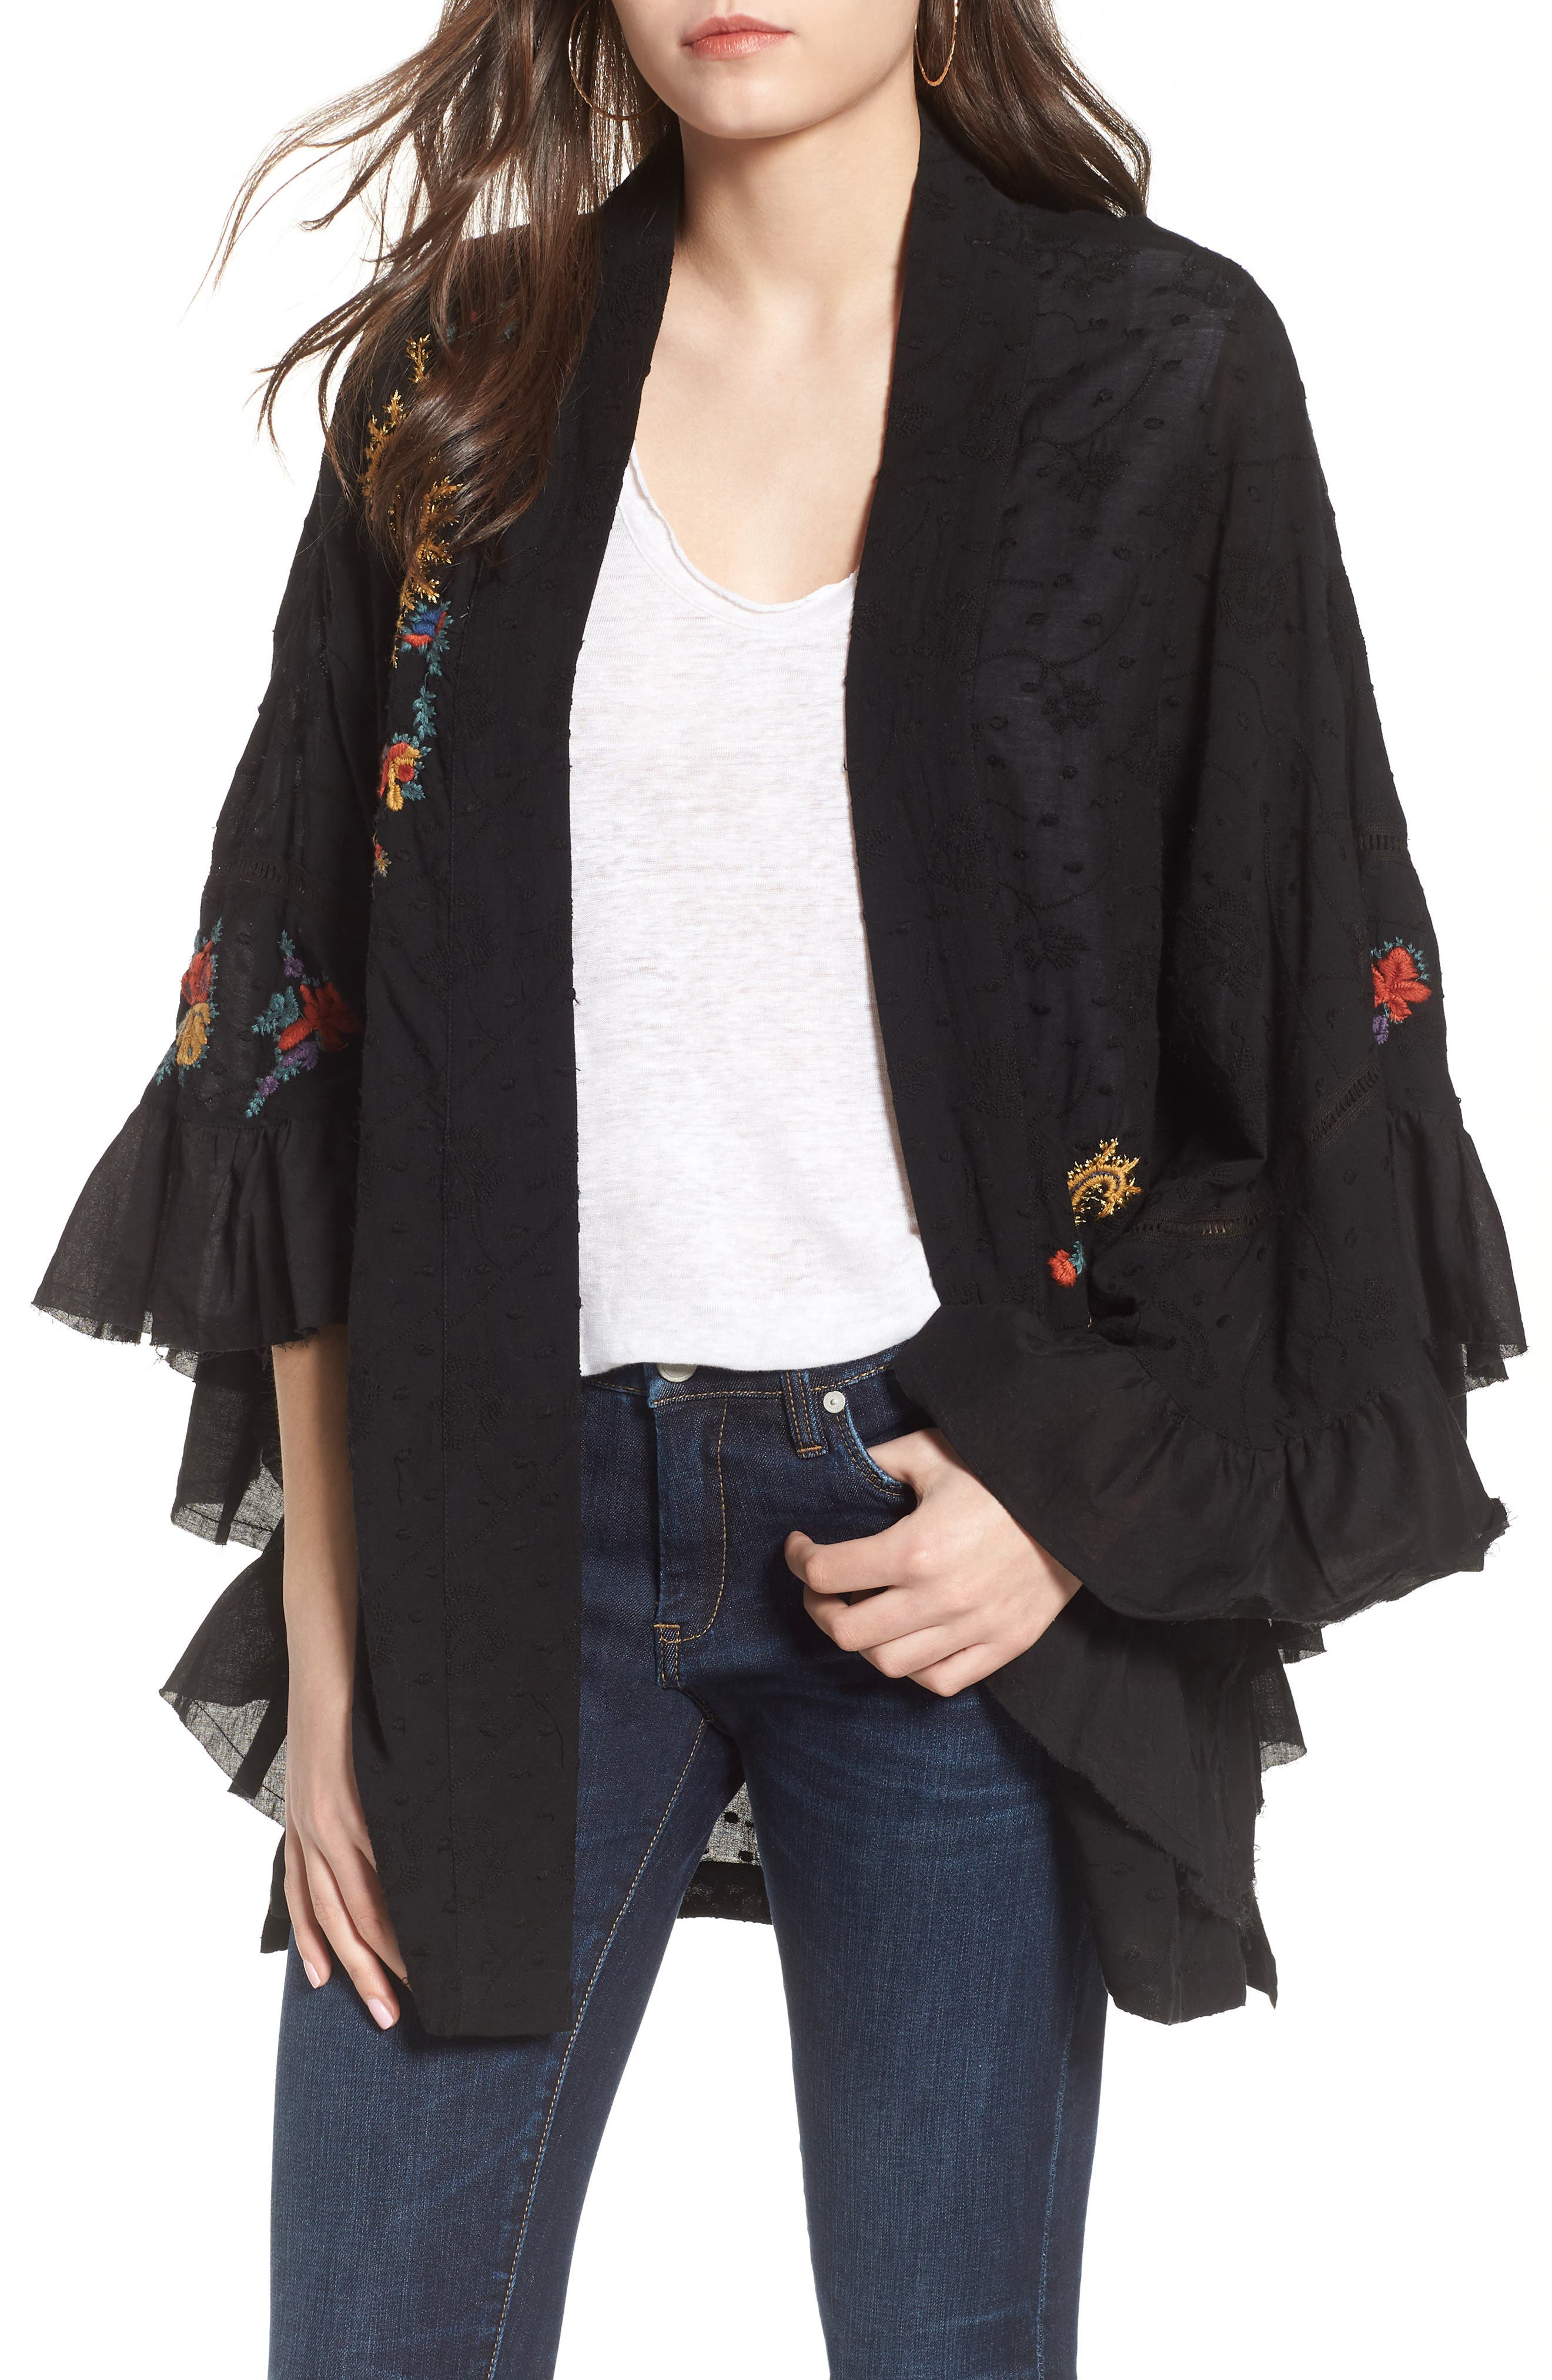 Dottie West Kimono,                             Main thumbnail 1, color,                             BLACK